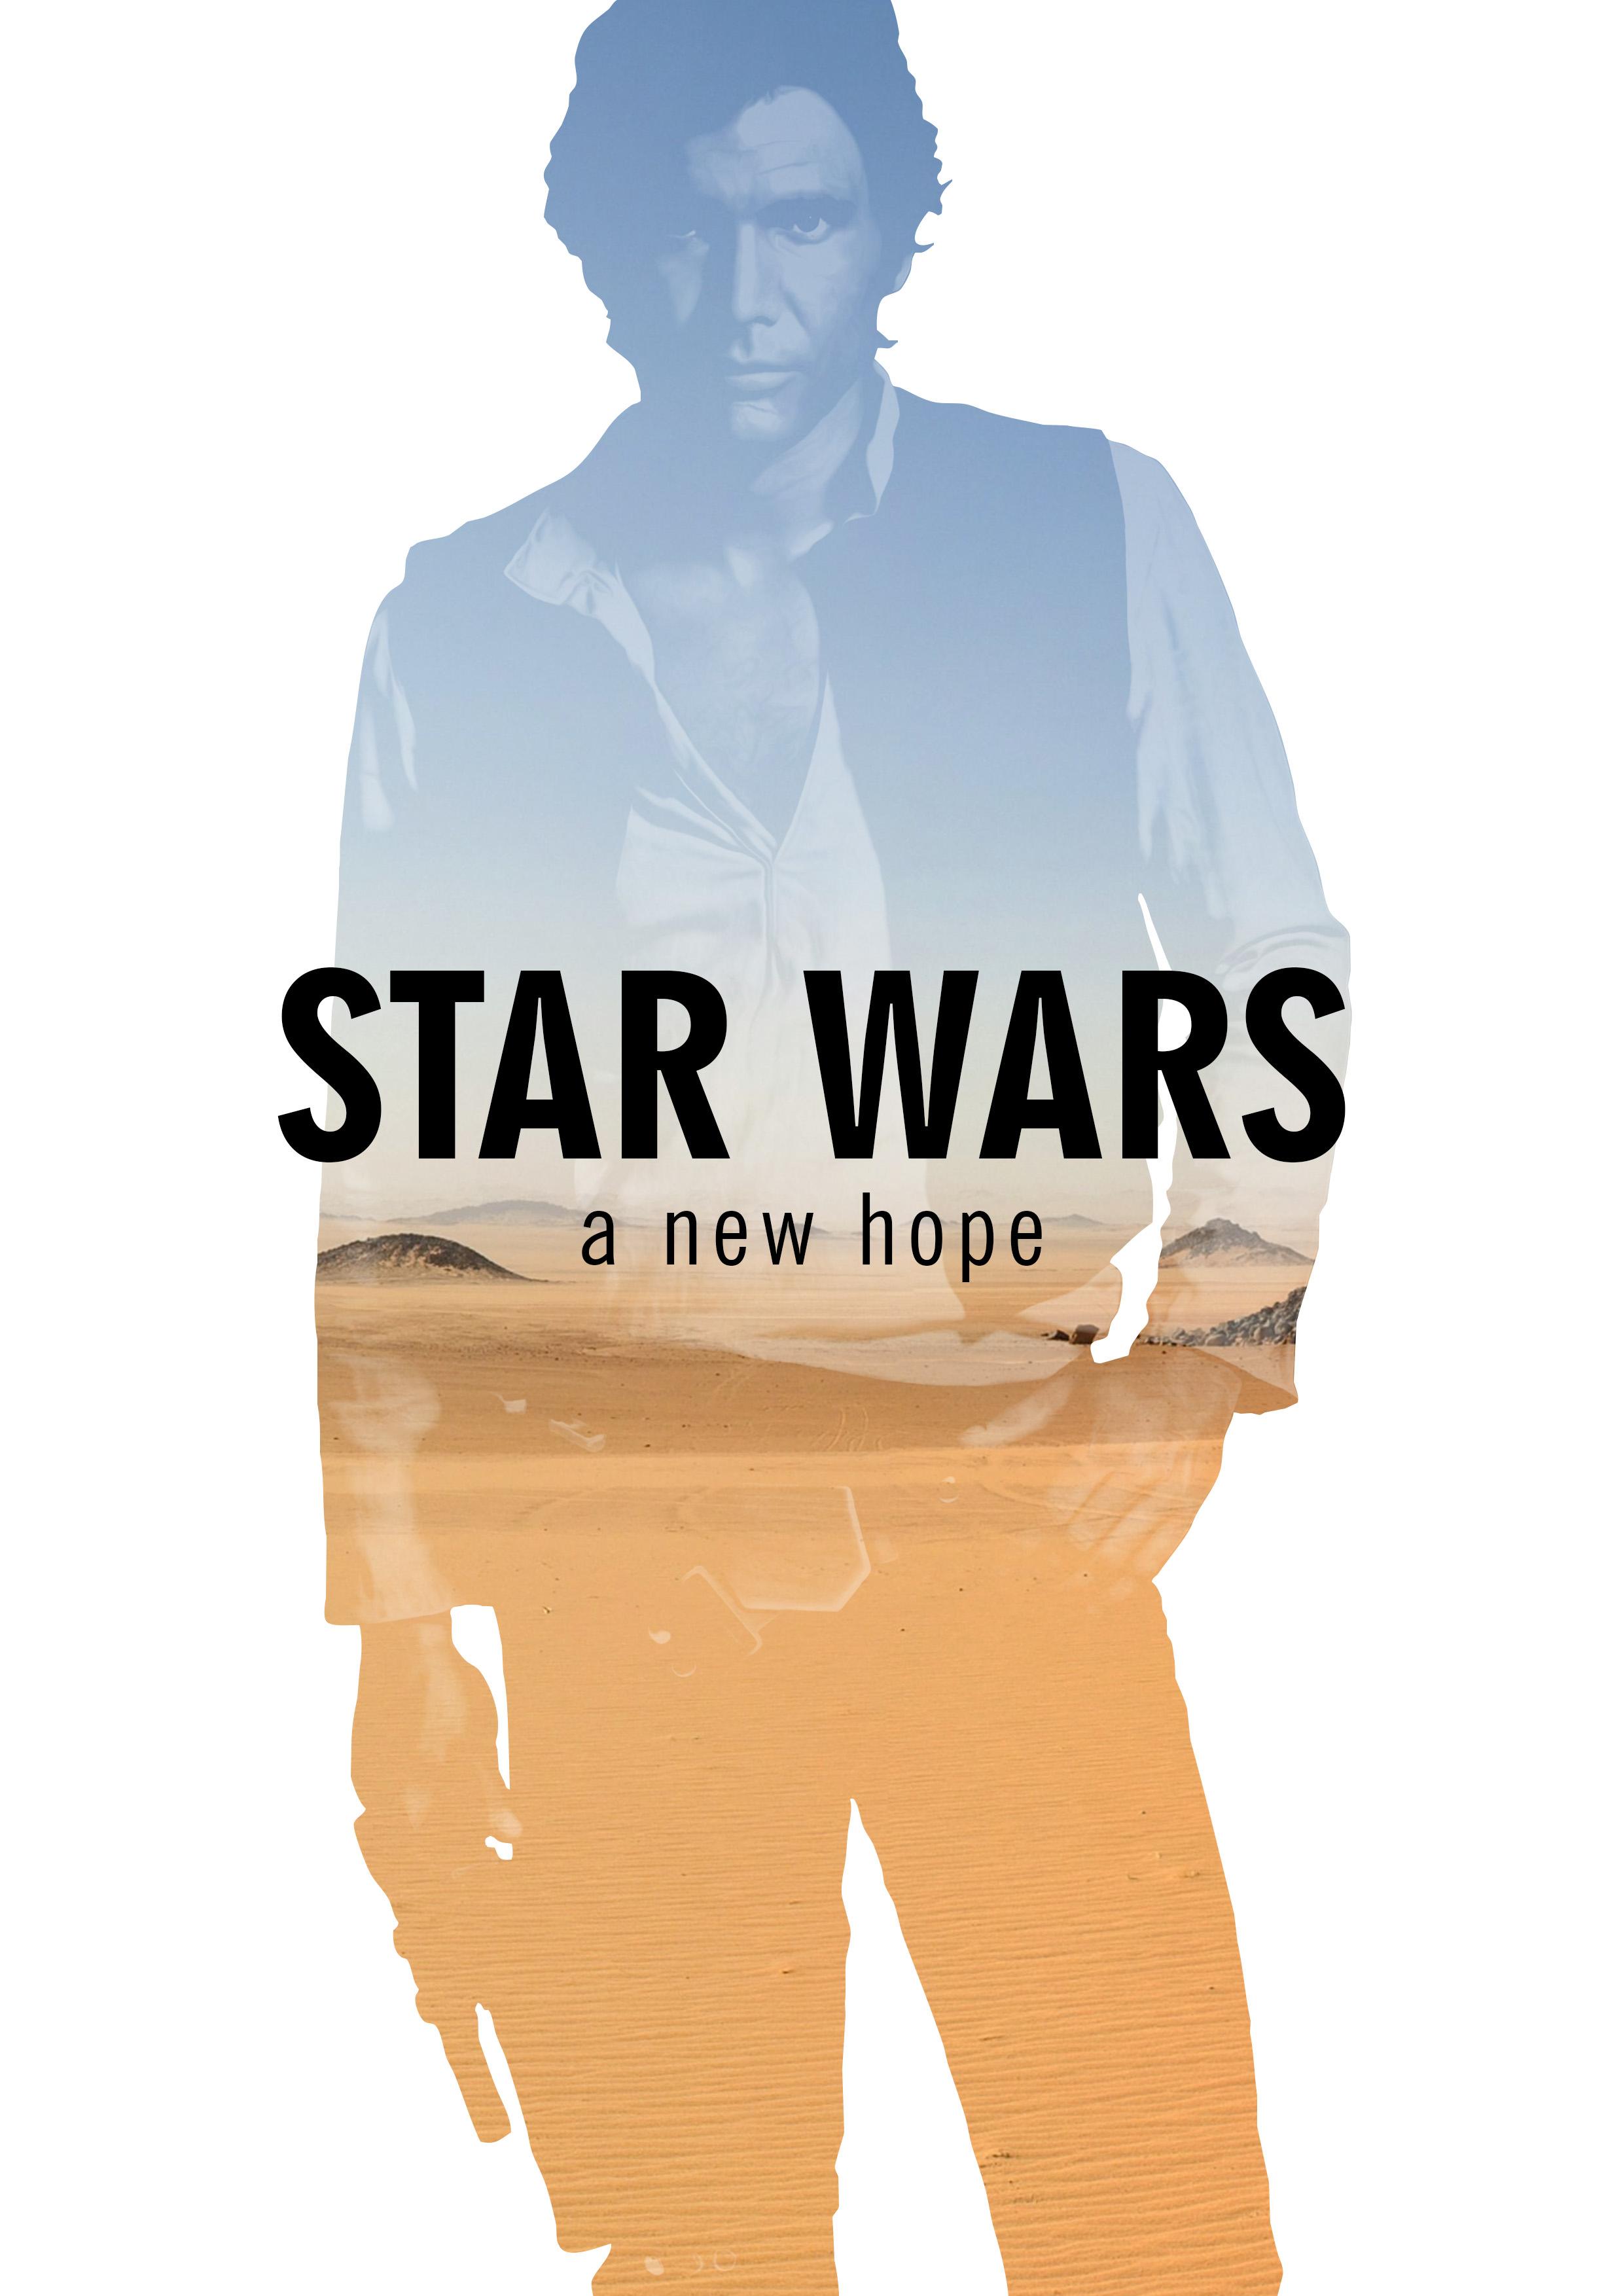 Star Wars Original Trilogy - Fanart posters